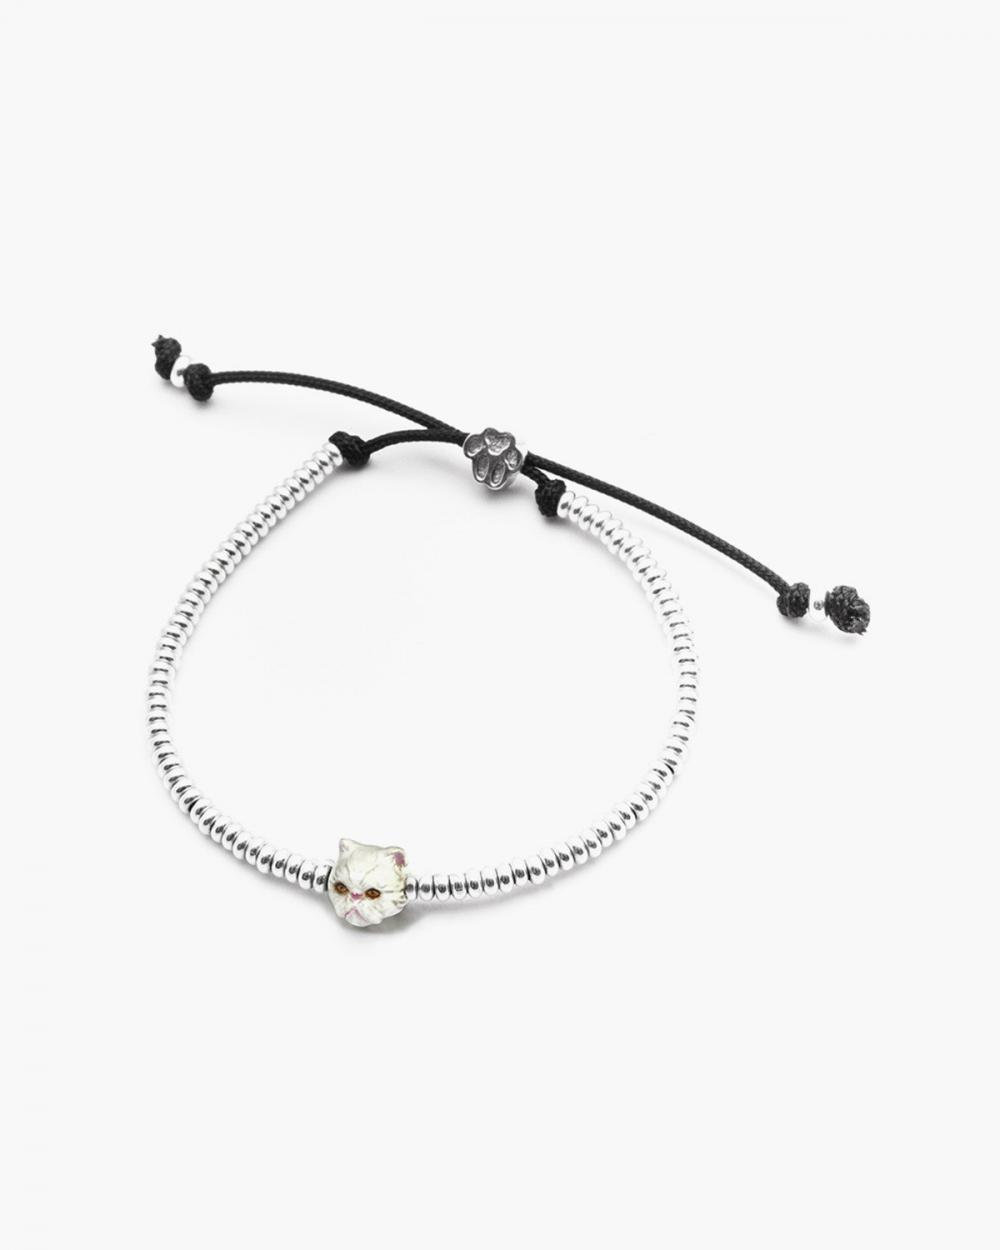 Bracelets PERSIAN SNOUT BRACELET / ENAMELLED NOVE25